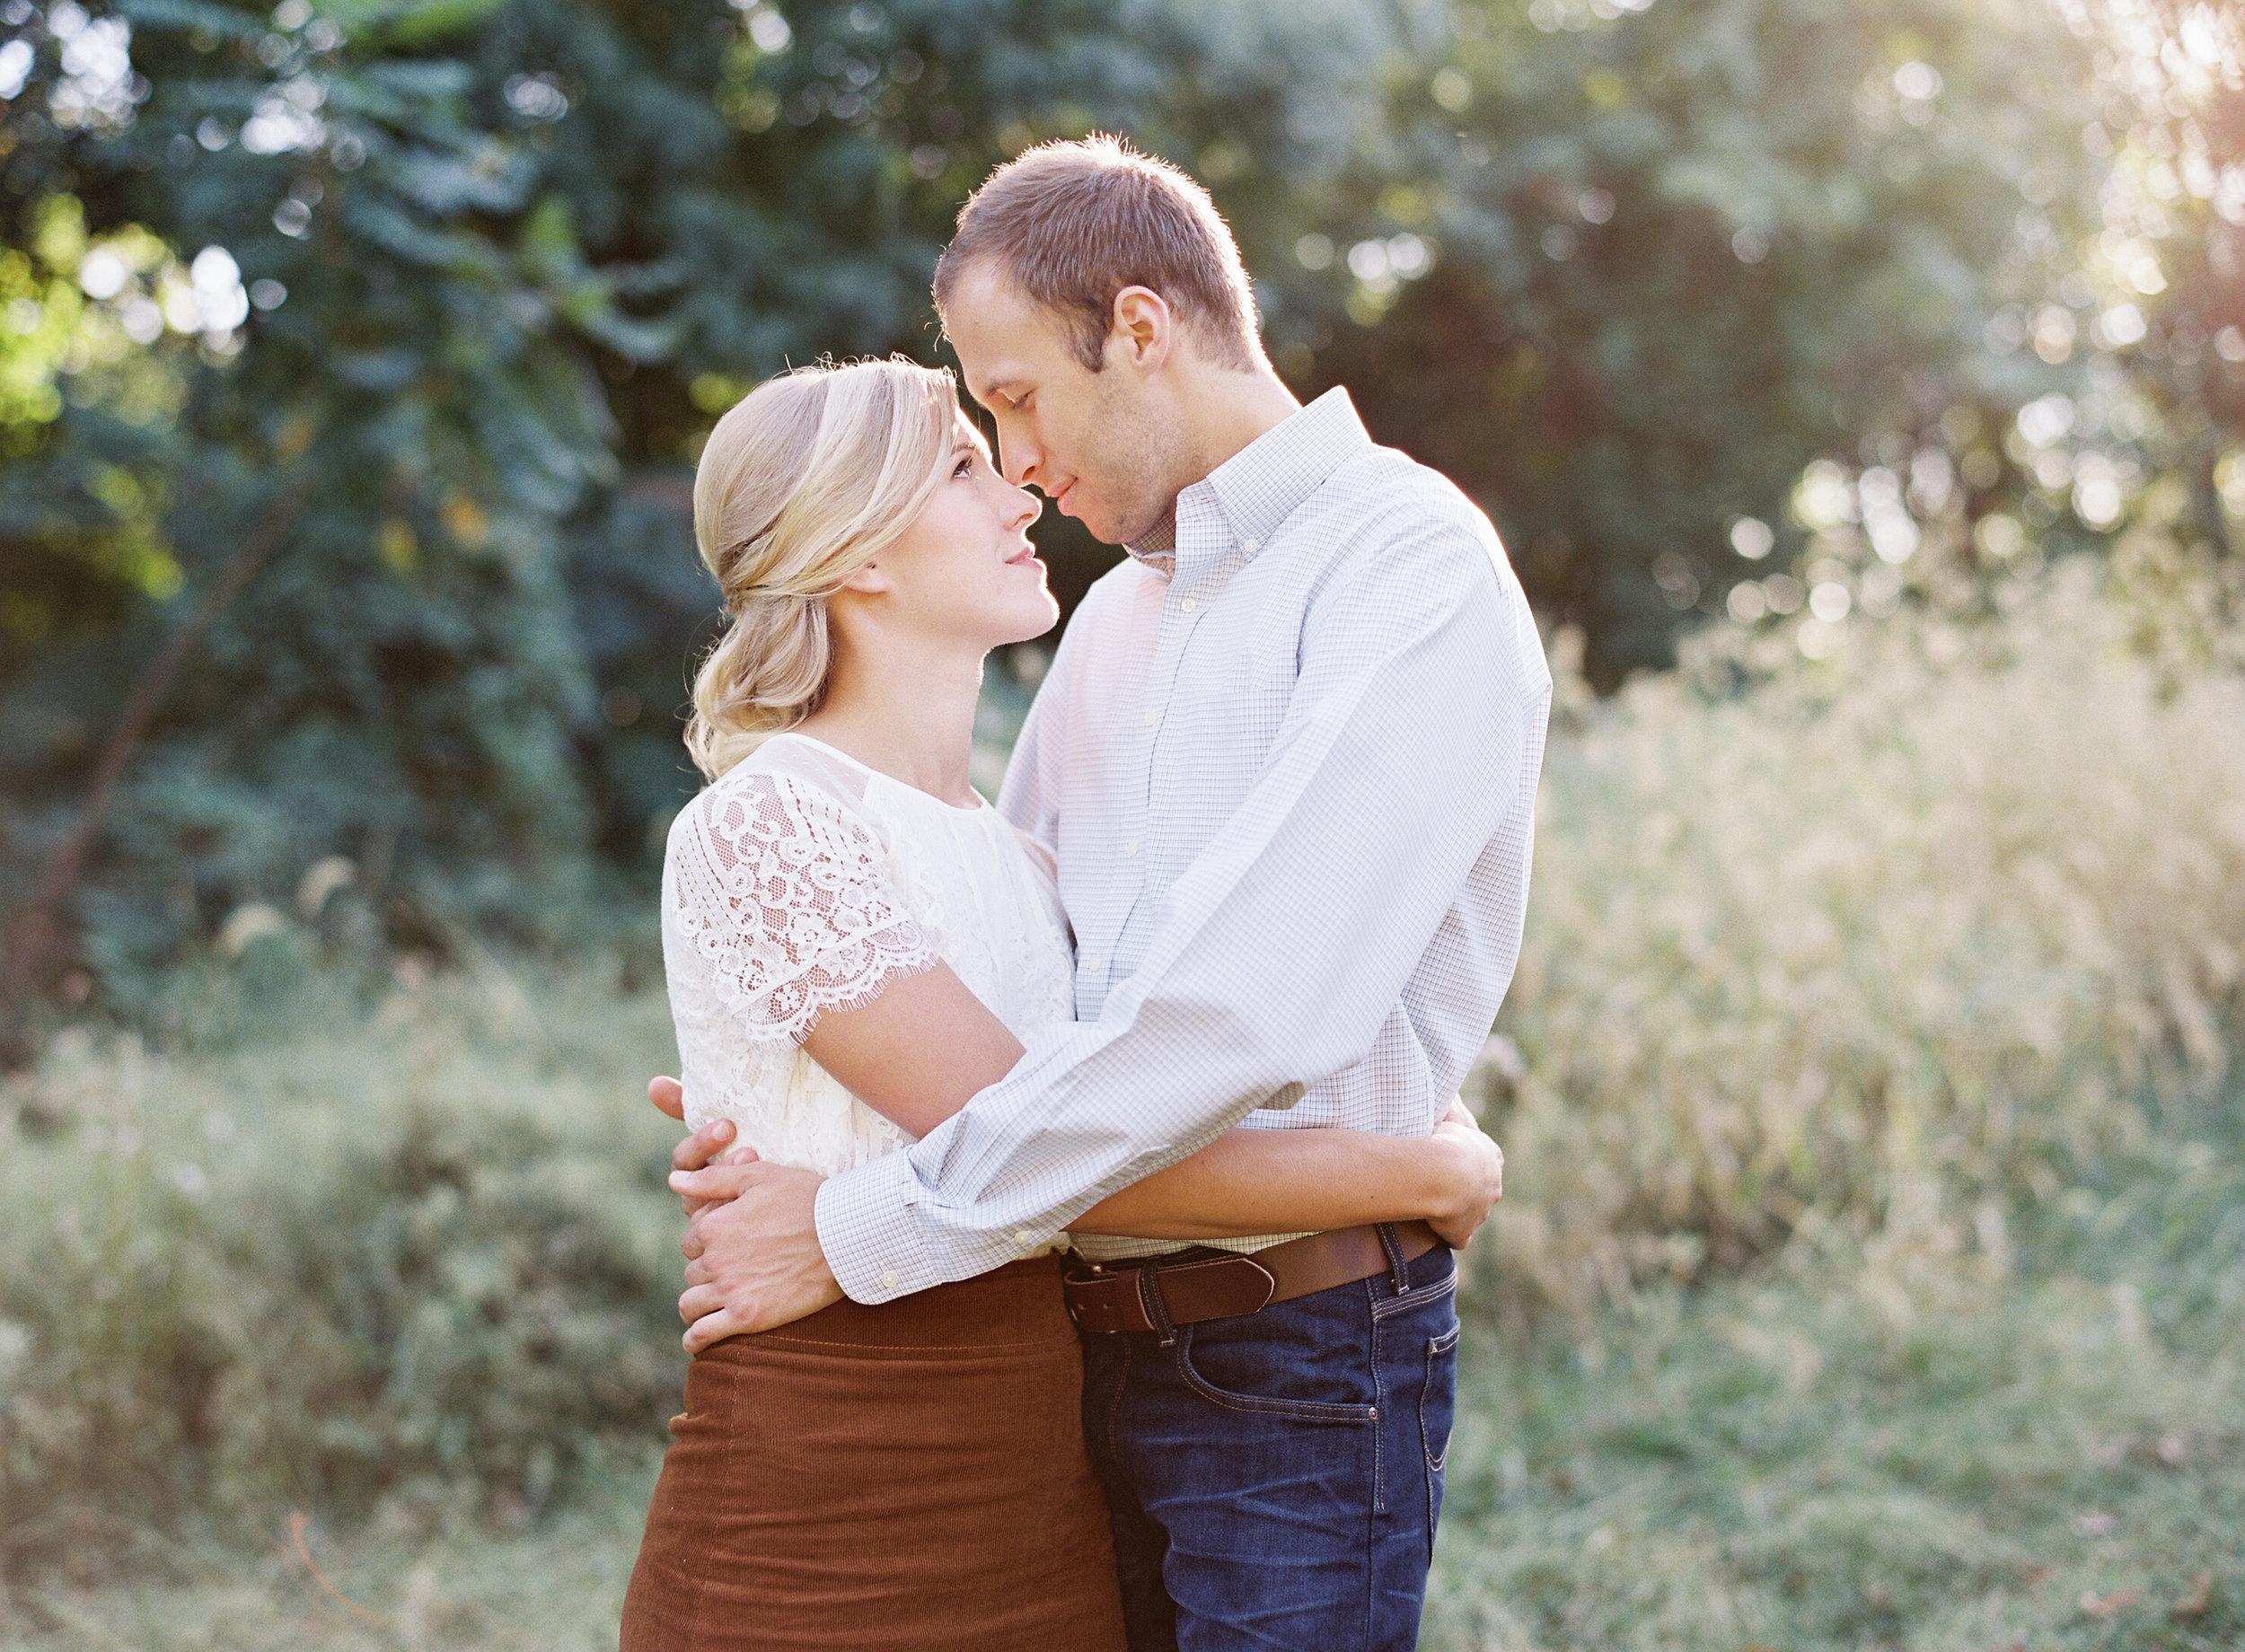 Meghan Mehan Photography | Fine Art Film Wedding Photographer | California | San Francisco | Napa | Sonoma | Santa Barbara | Big Sur | Los Angeles | Destination Wedding Photographer 008.jpg